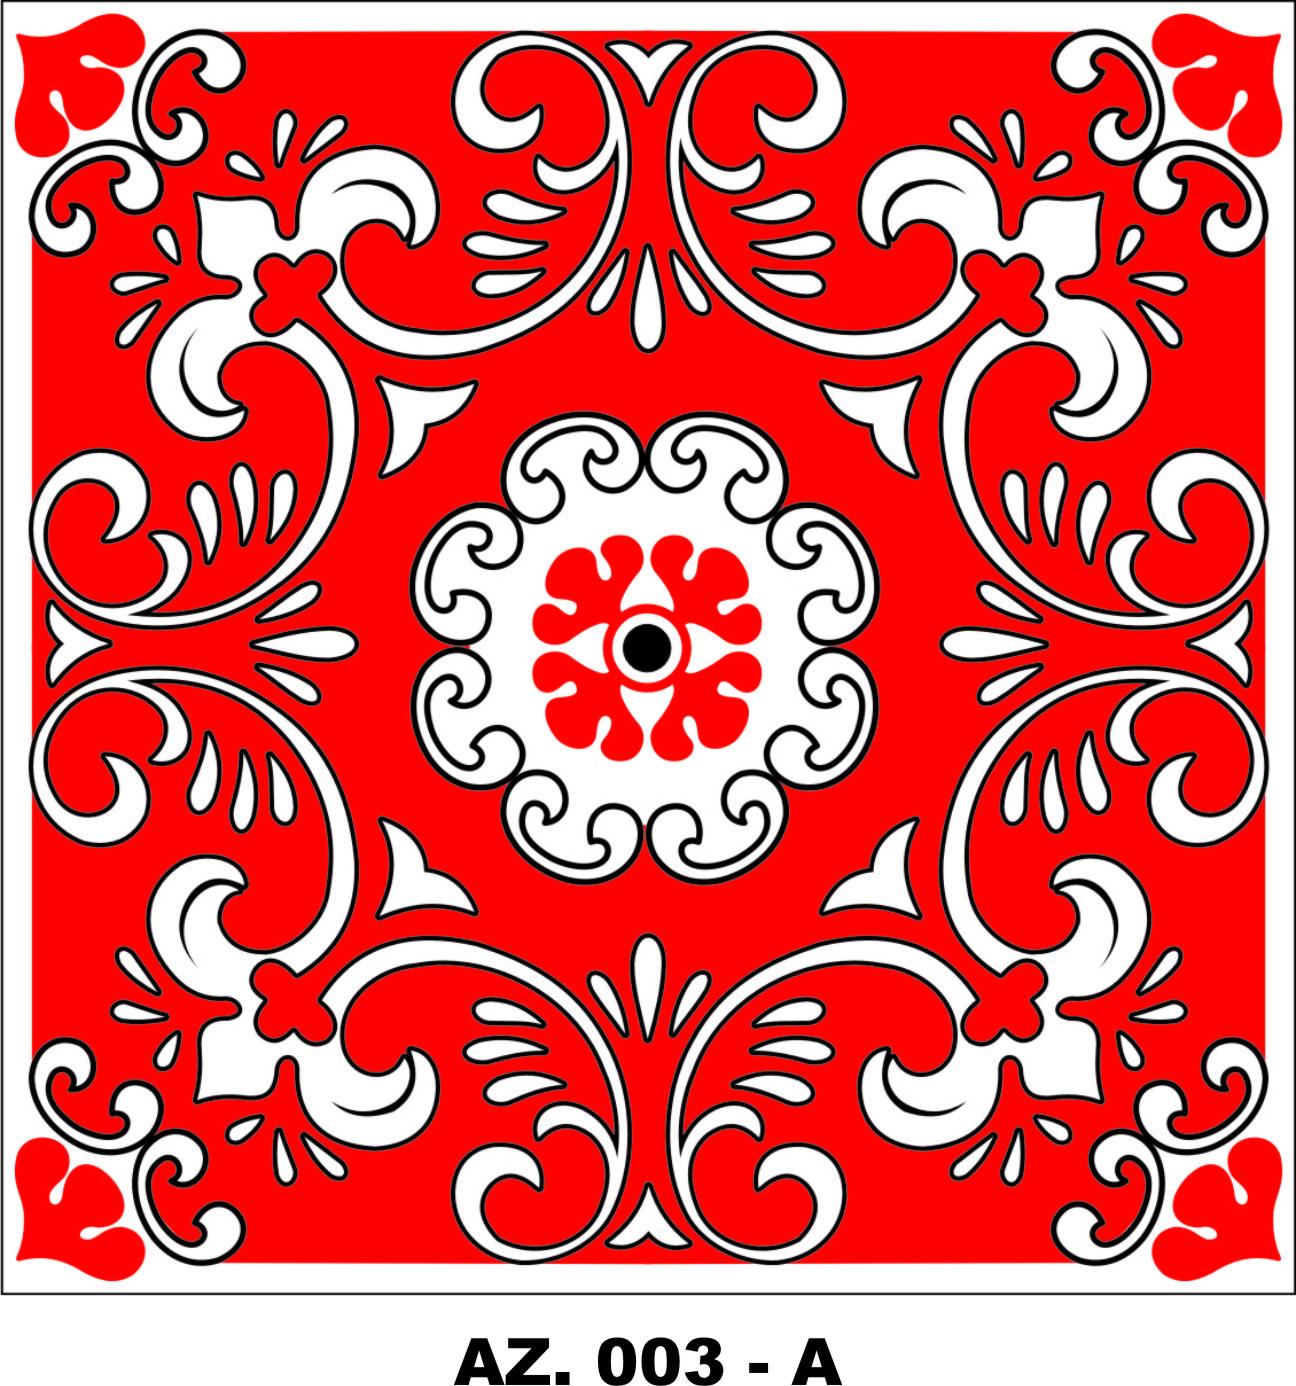 Azulejos coloridos e decorados para mosaico - Azulejos para mosaicos ...